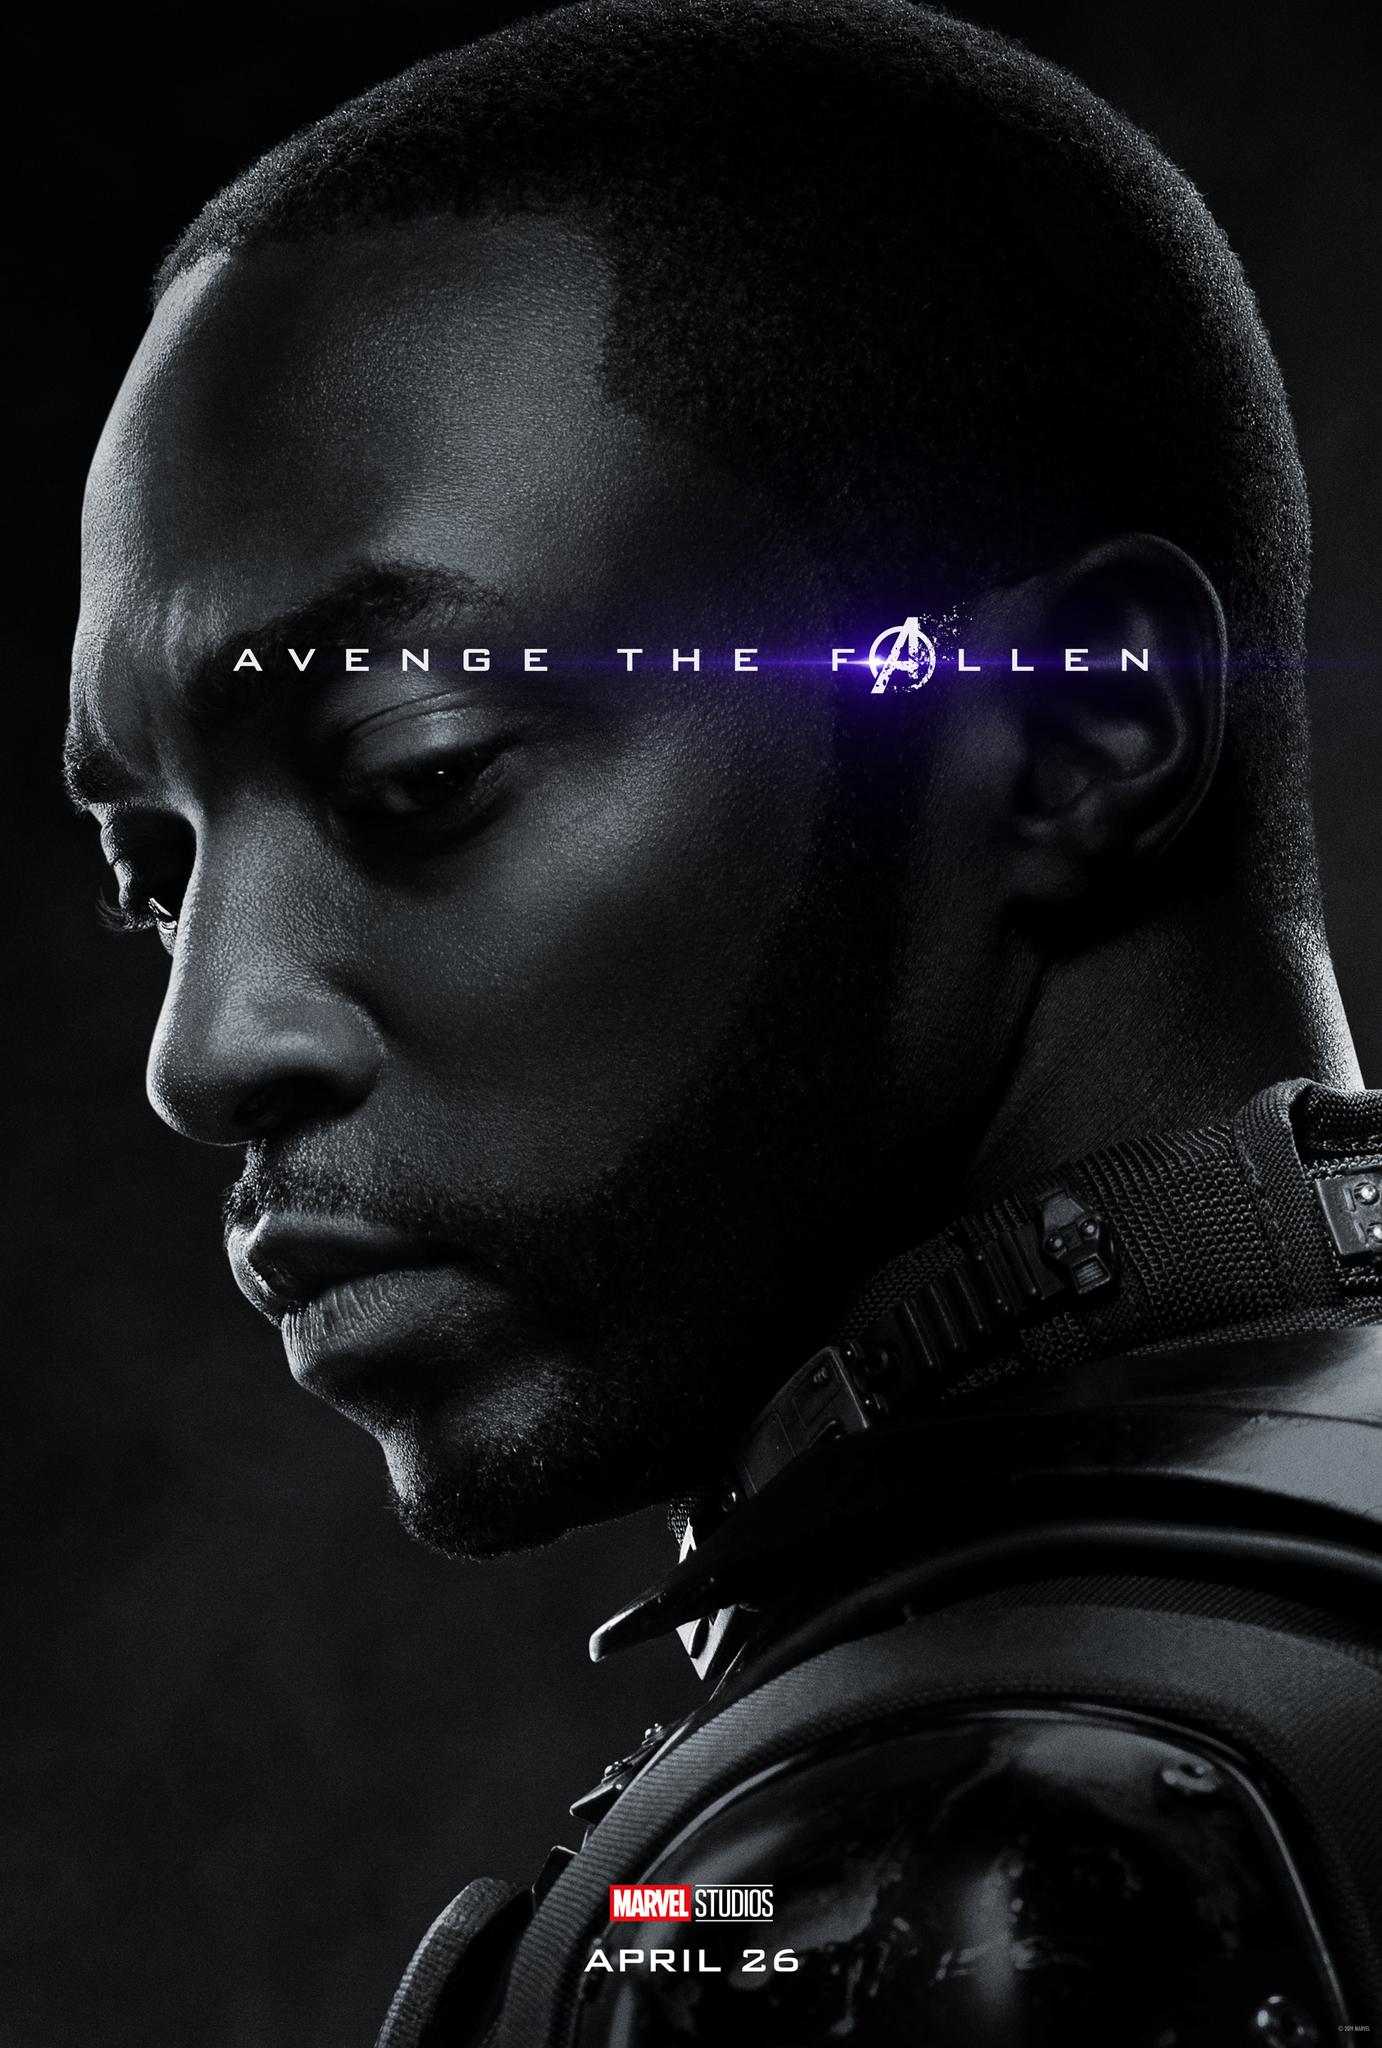 Anthony Mackie in Avengers: Endgame (2019)